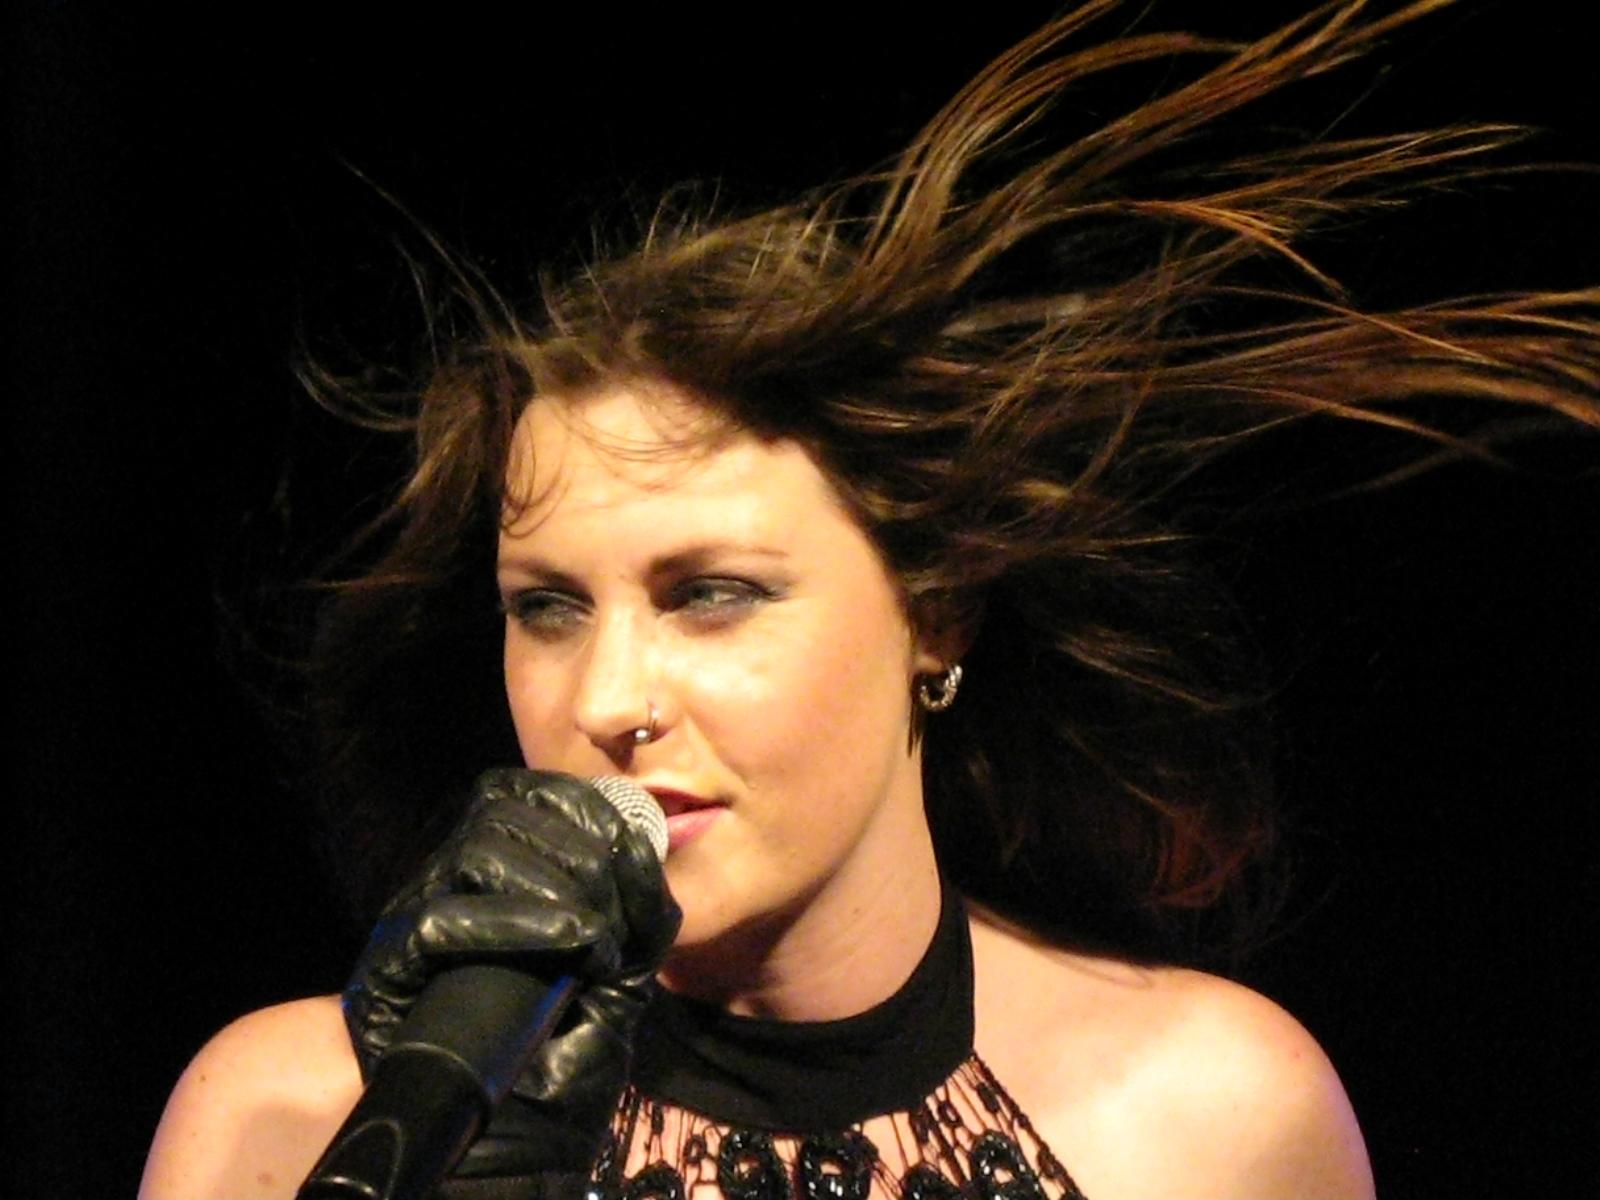 برچسب Floor Jansen Mp3 Download Download The Best Music In The World